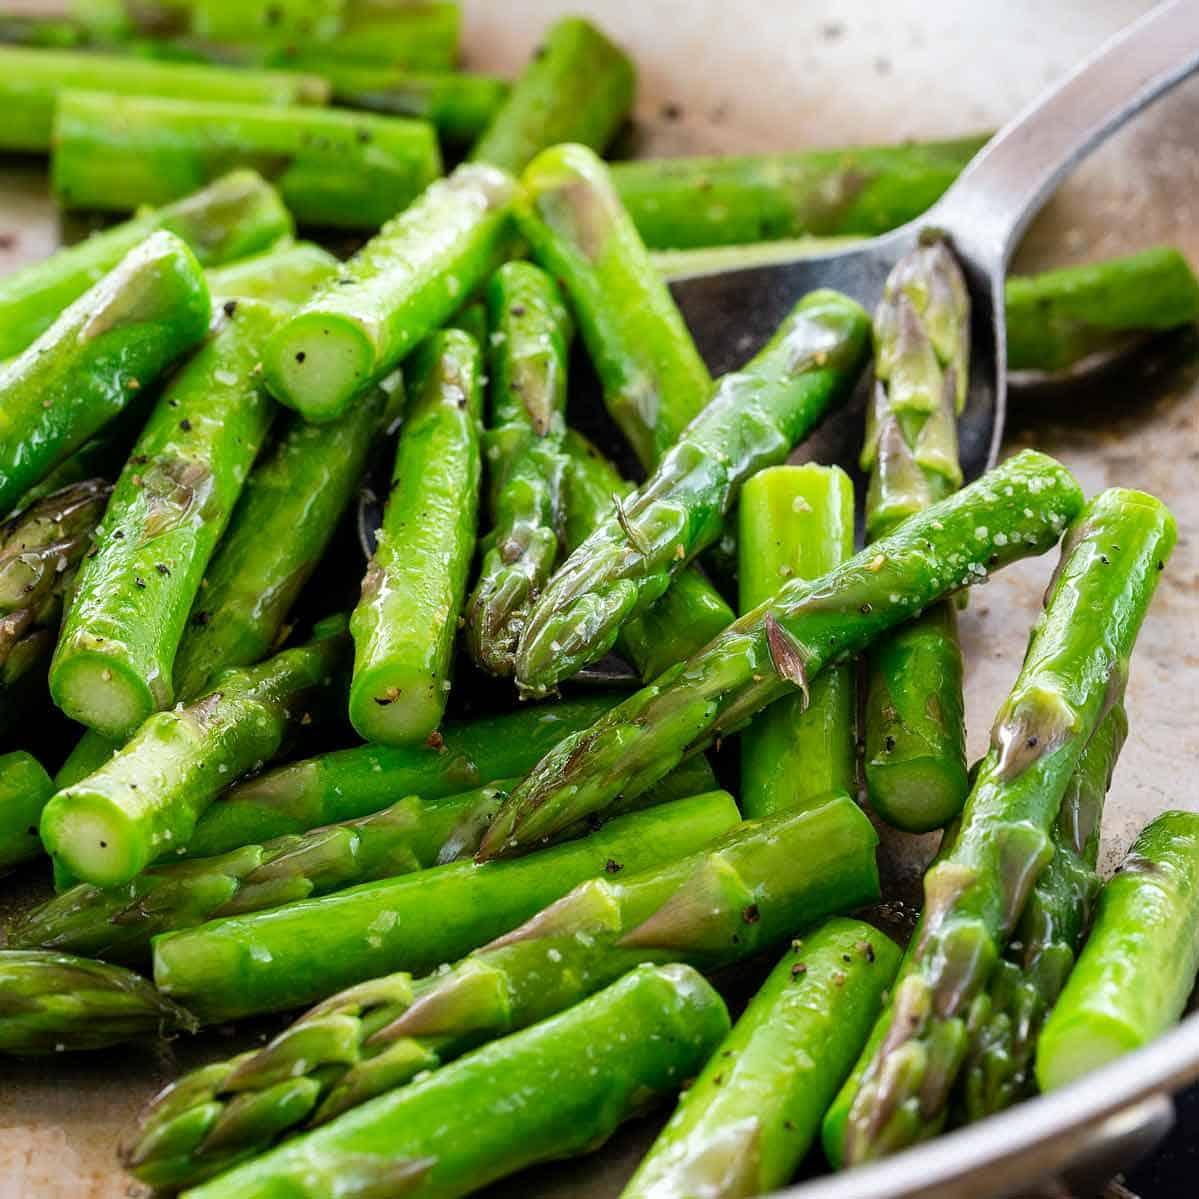 How to Cook Asparagus (6 Easy Methods) - Jessica Gavin